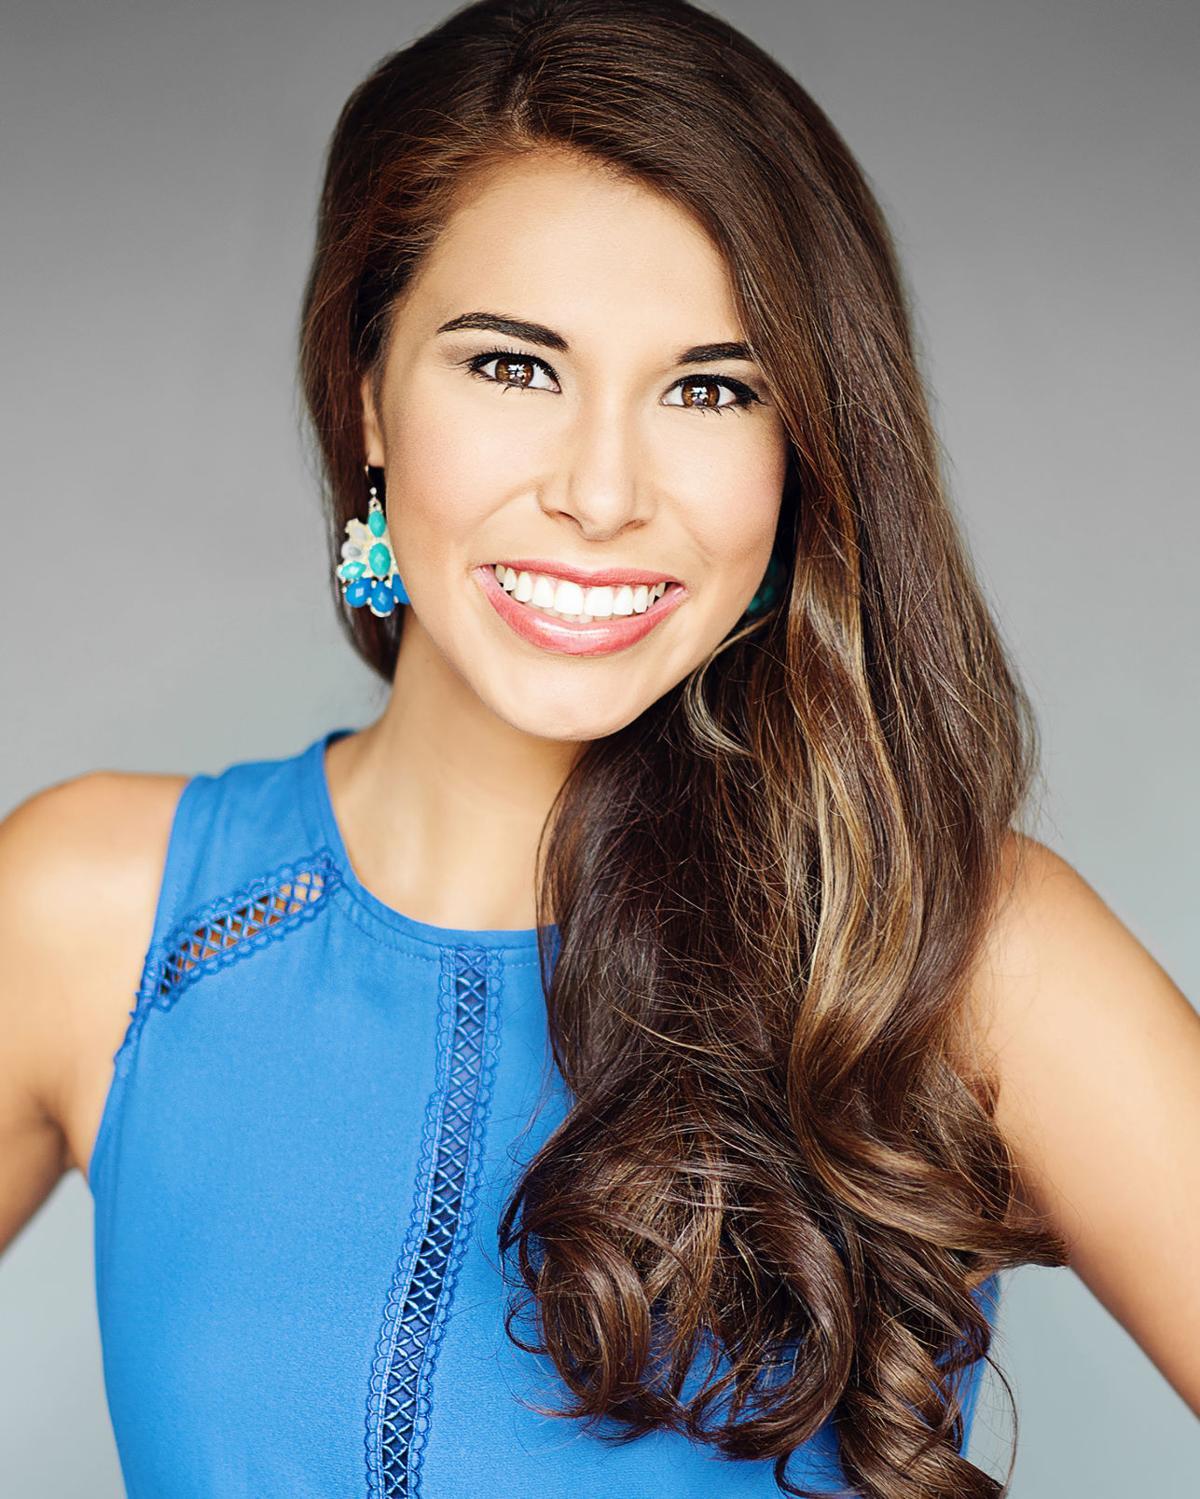 Miss Indiana 2017 Haley Begay